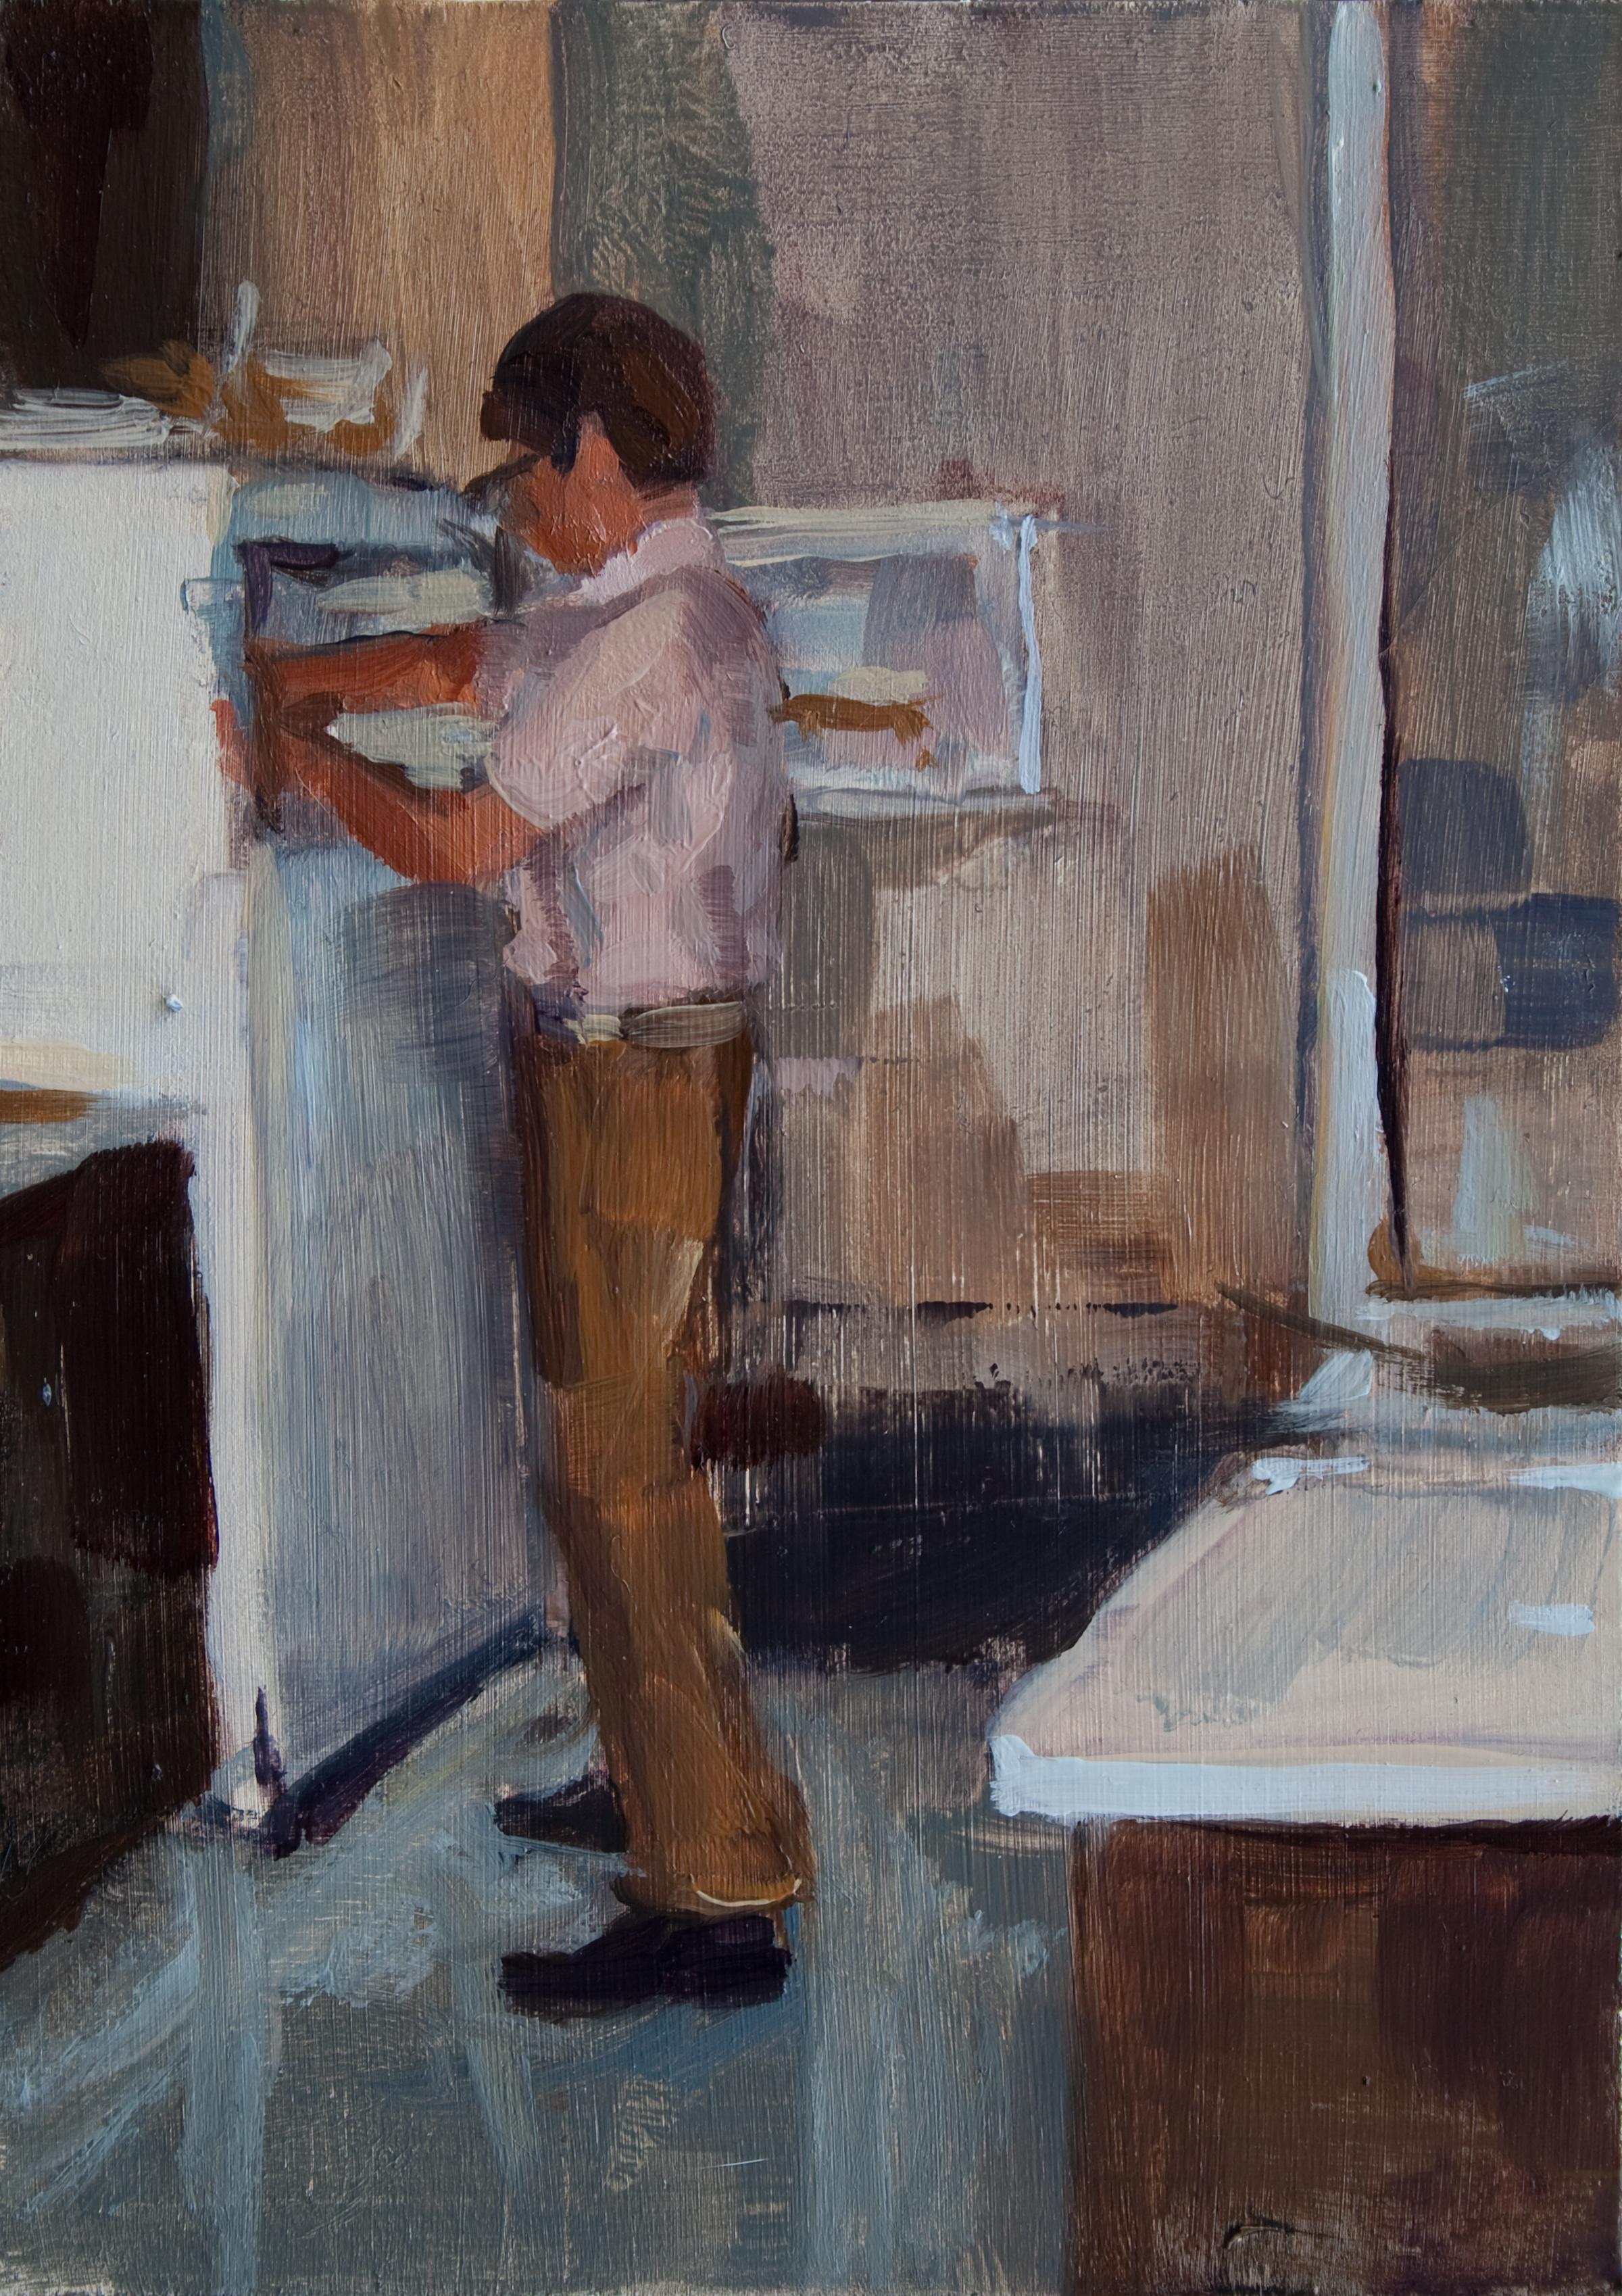 "Dad with Fridge, oil on panel, 7"" x 5"", 2012"